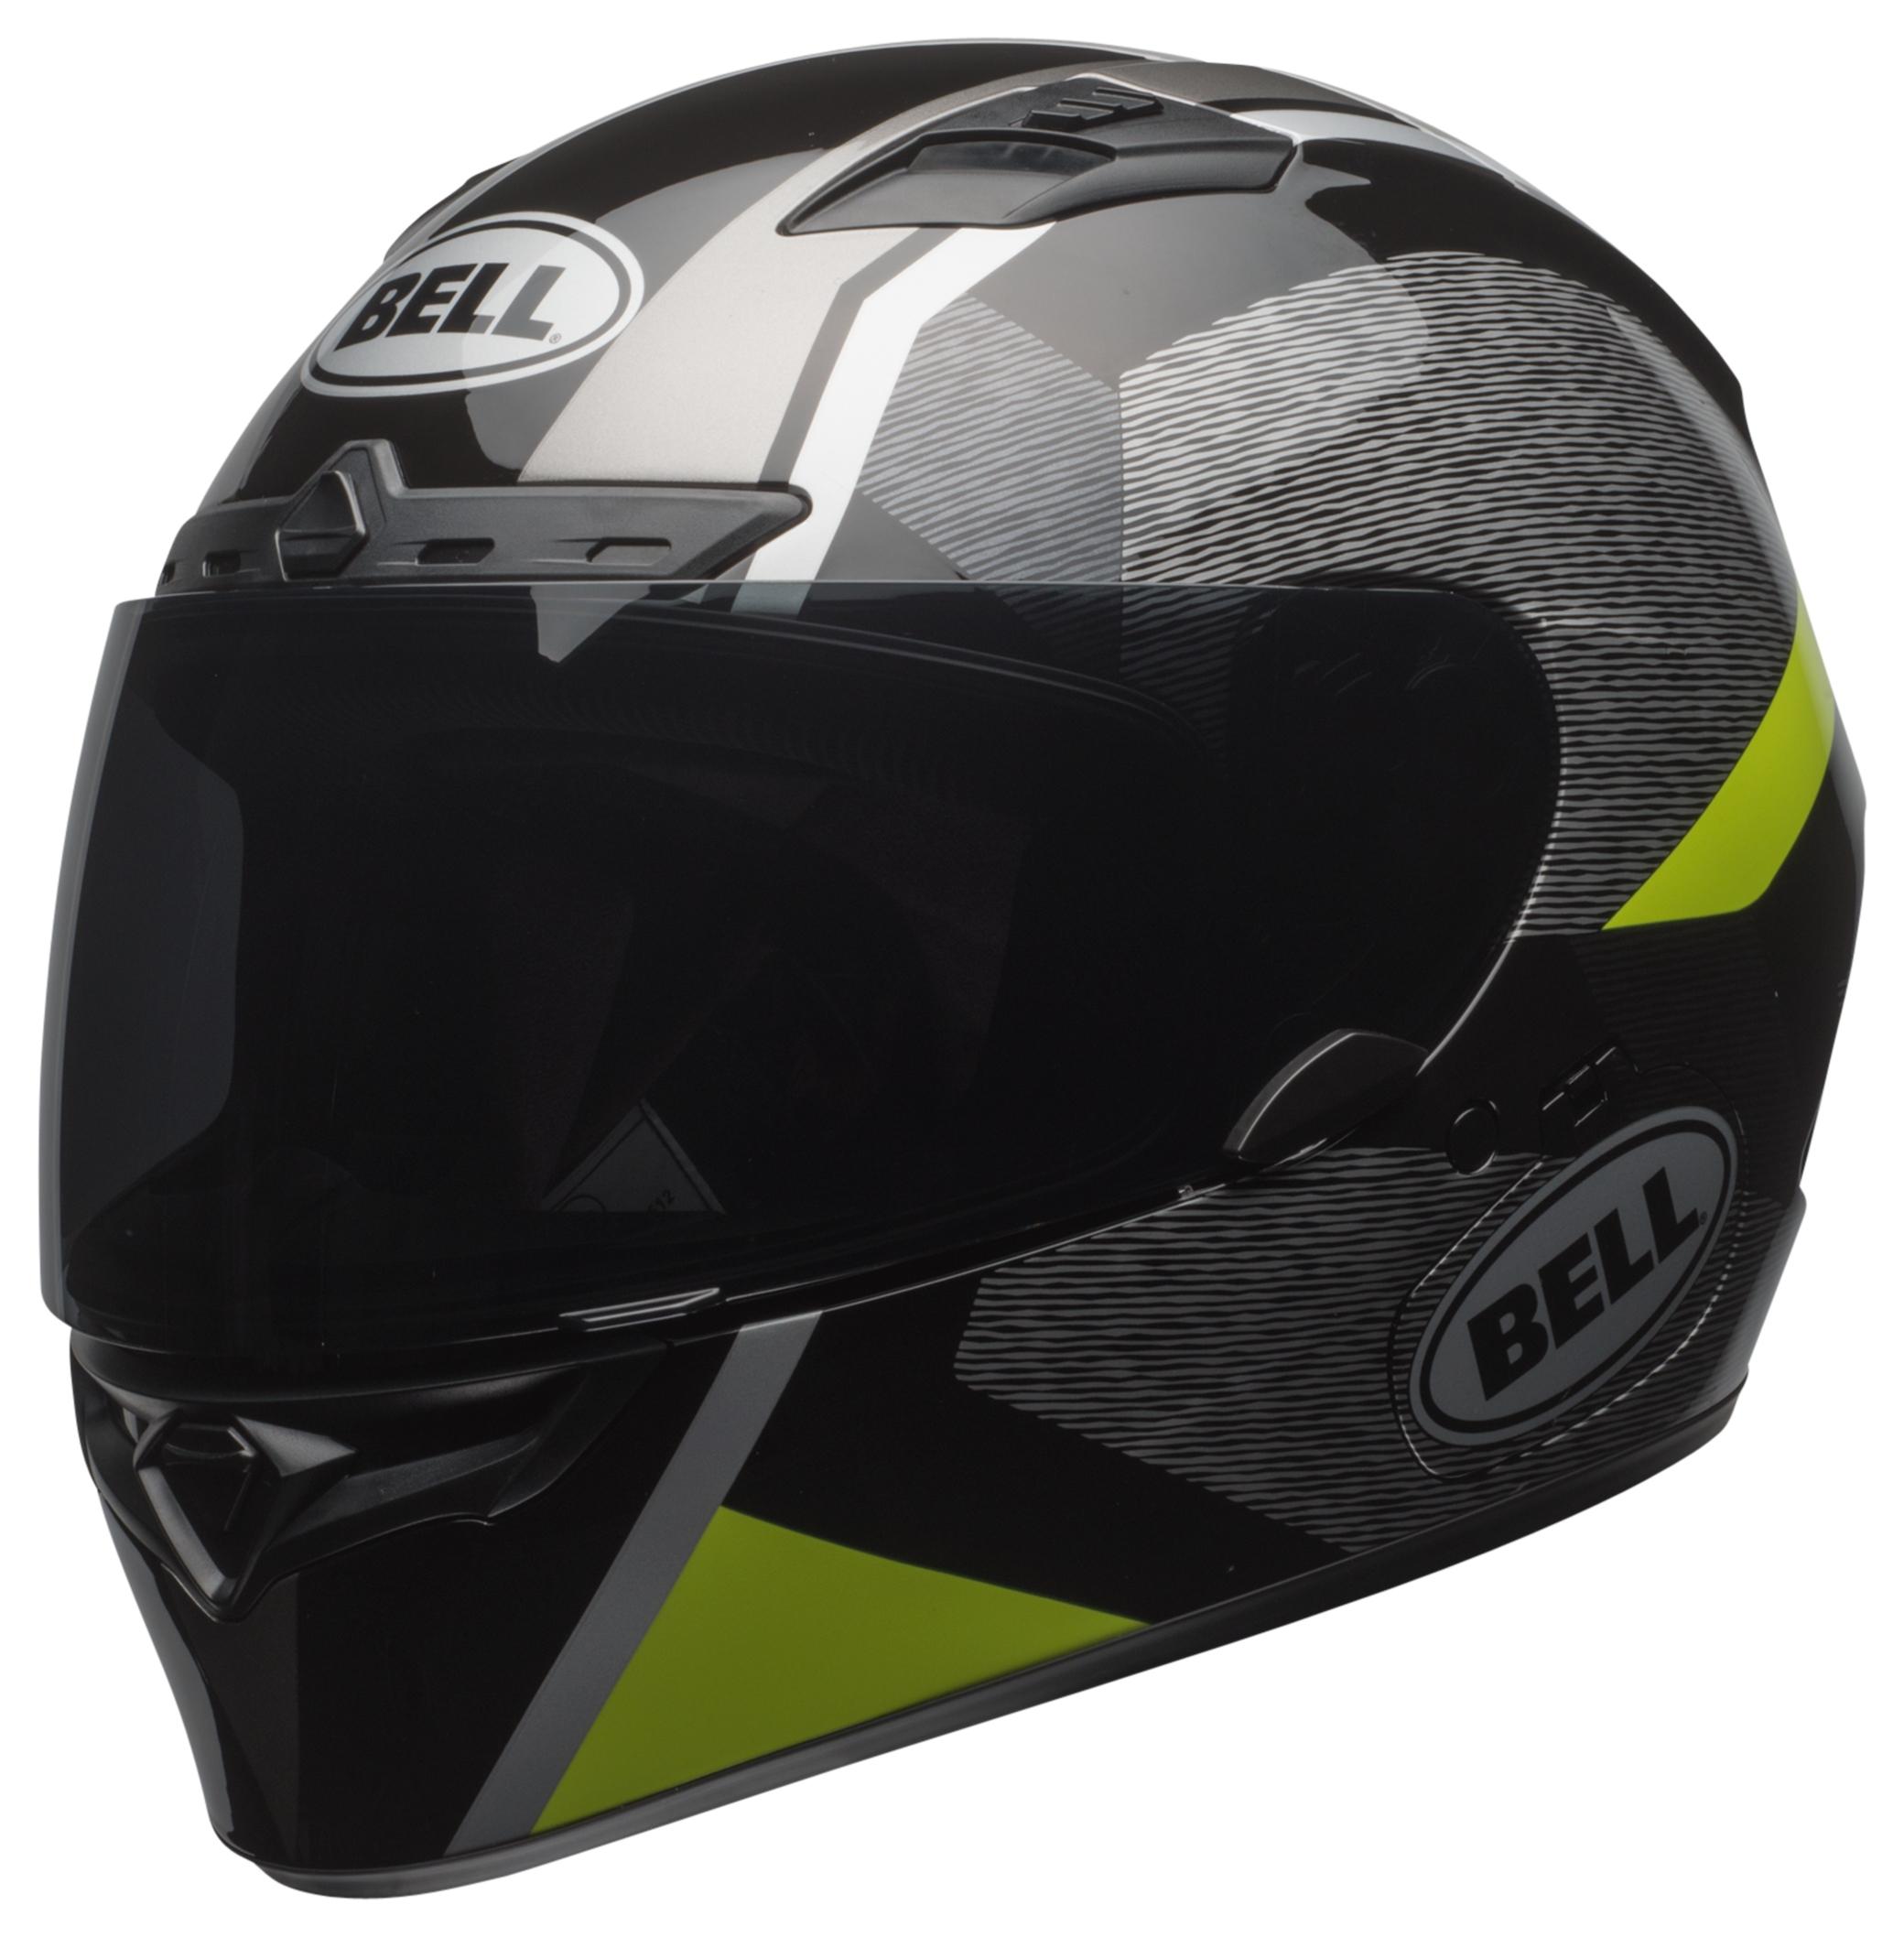 Bell Qualifier DLX MIPS Accelerator Helmet (SM) | 20% ($53 99) Off!